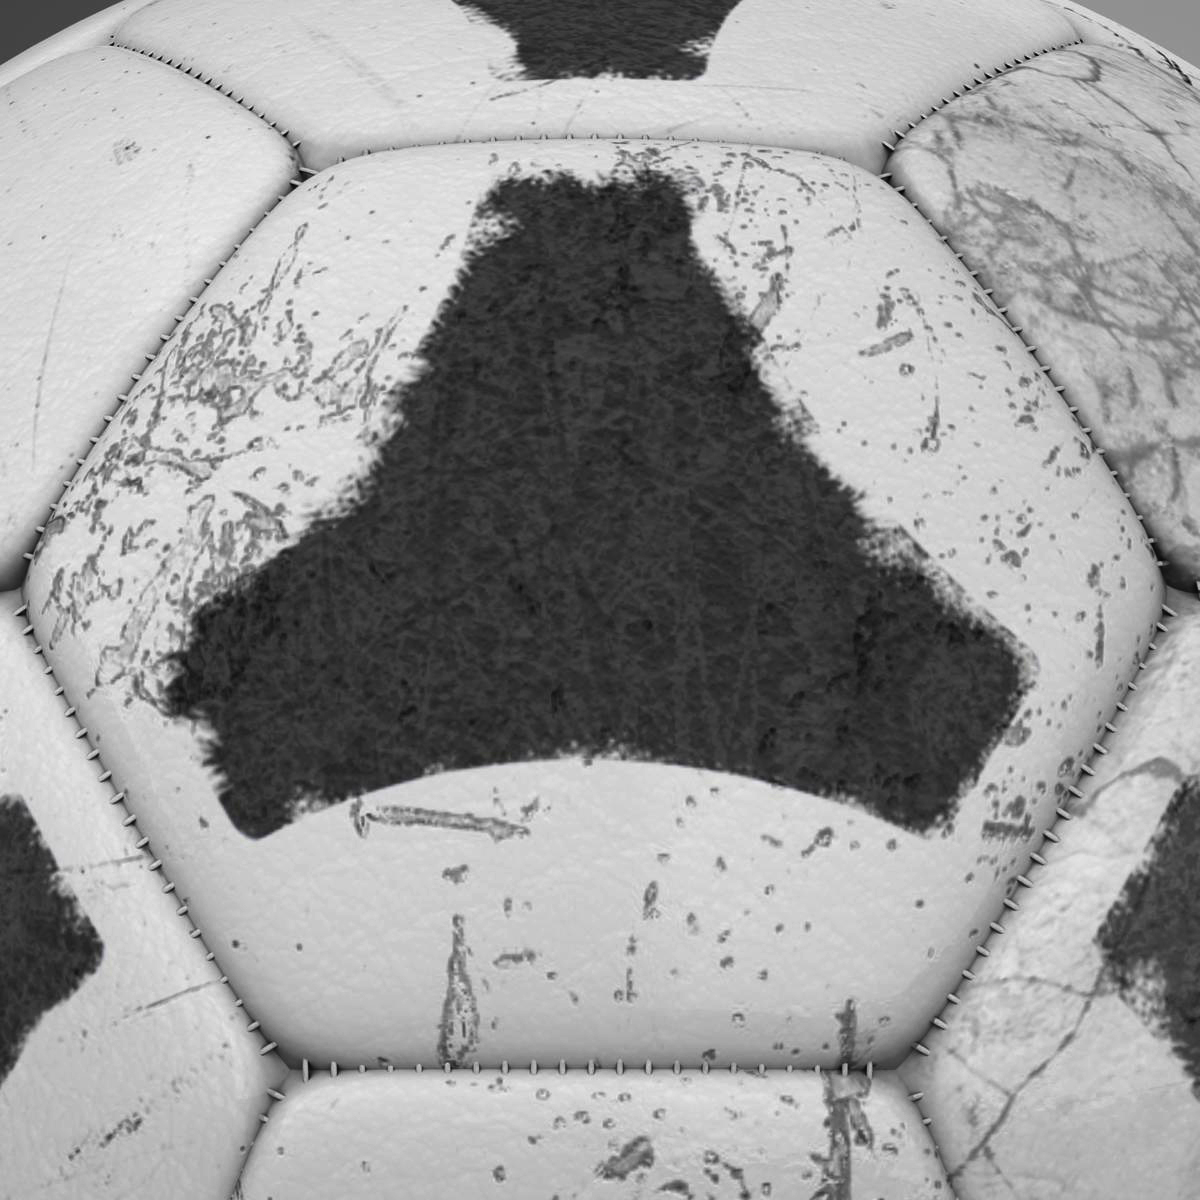 soccerball хар цагаан tri 3d загвар 3ds max fbx c4d ma mb obj 204055